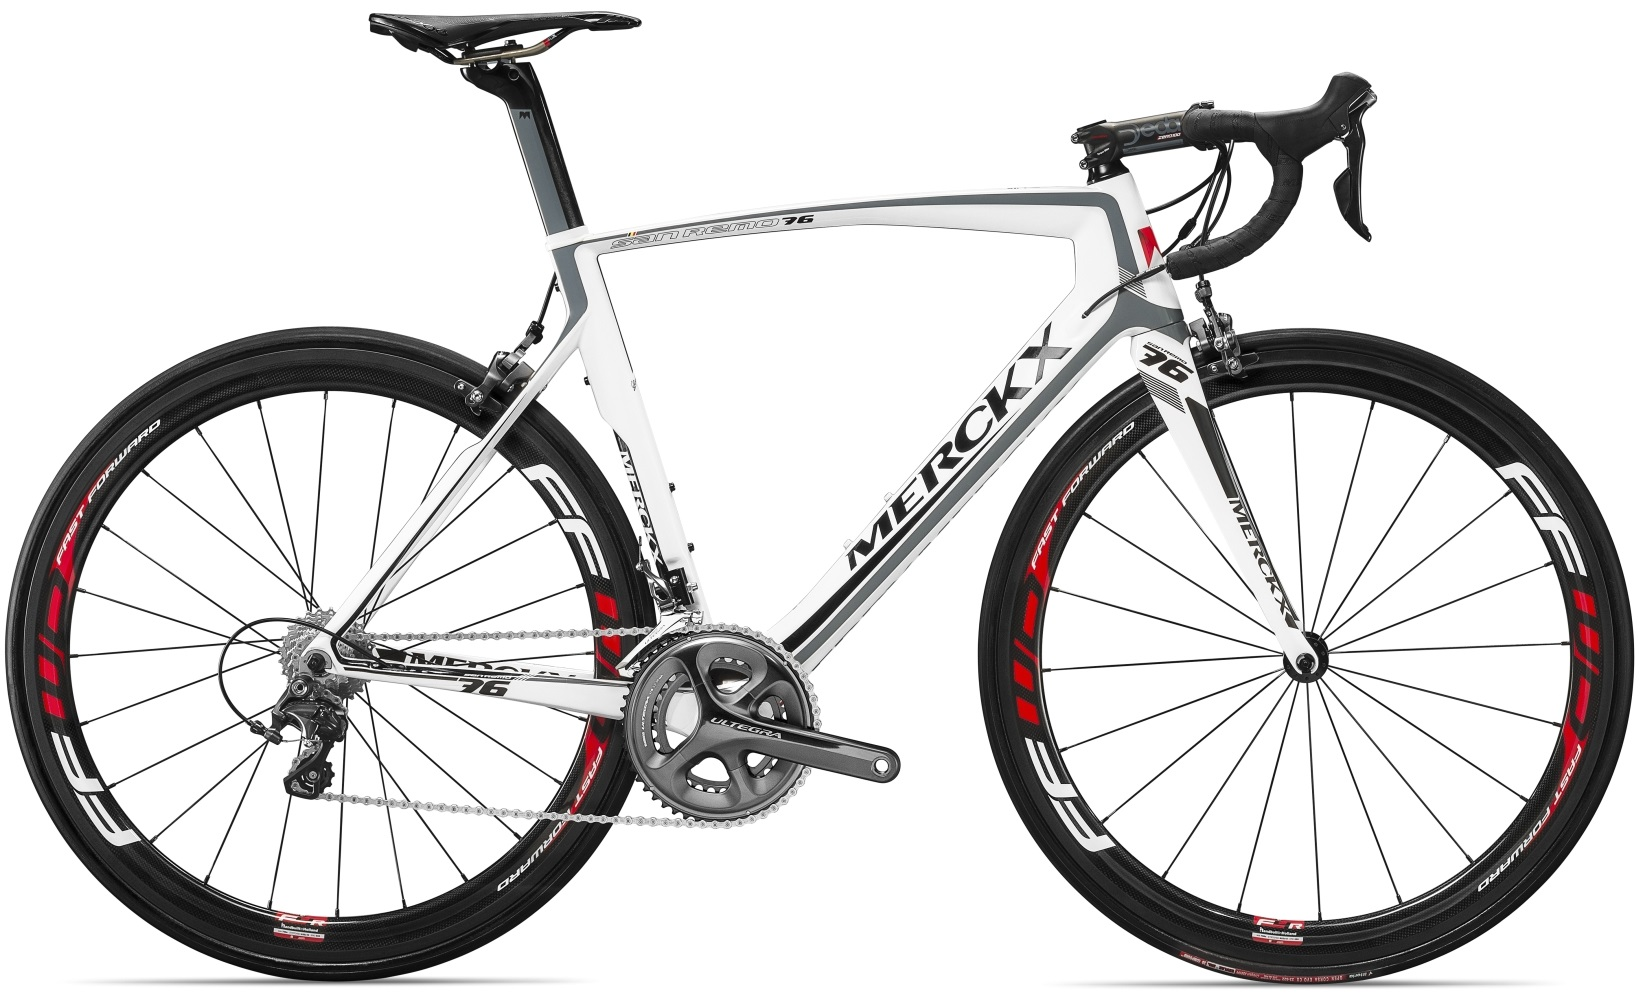 2015 Merckx San Remo76 white grey ultegraneuroticarnutz2015 Merckx San Remo76 white grey ultegraSarto Dinamica 2015 grey red campy